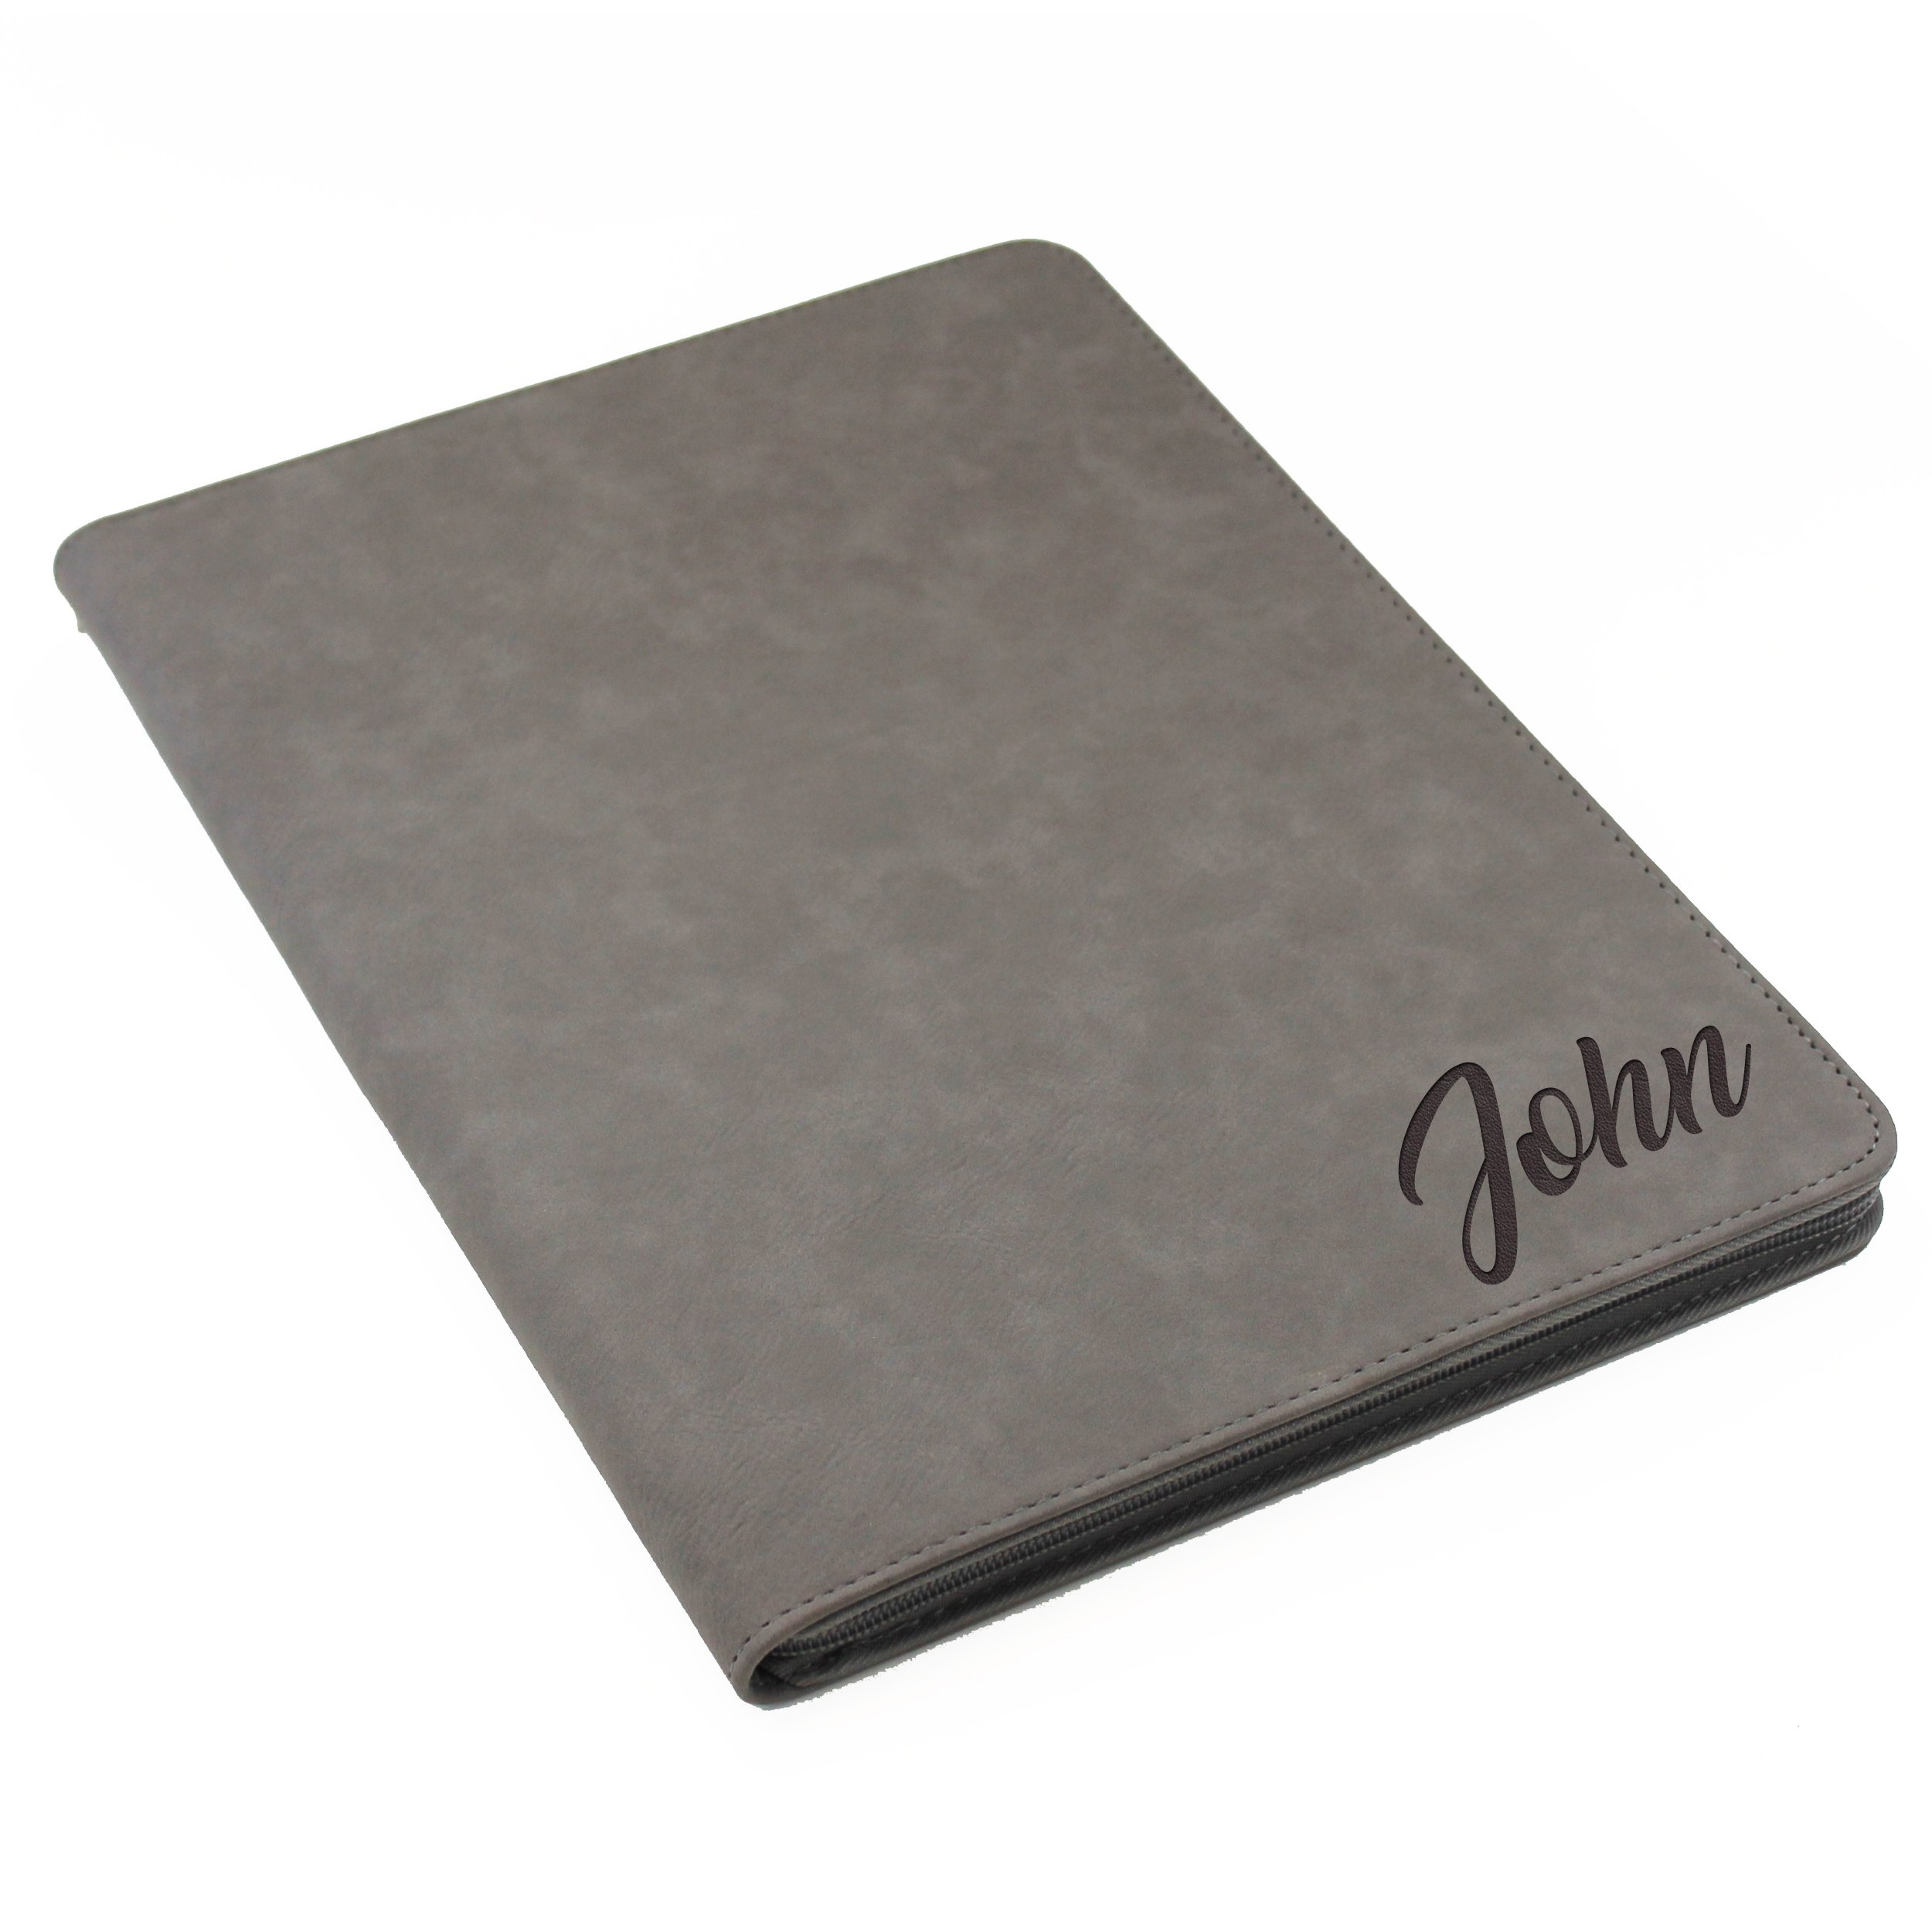 Monogrammed Portfolio with Zipper, Custom Personalized Padfolio Pad Holder